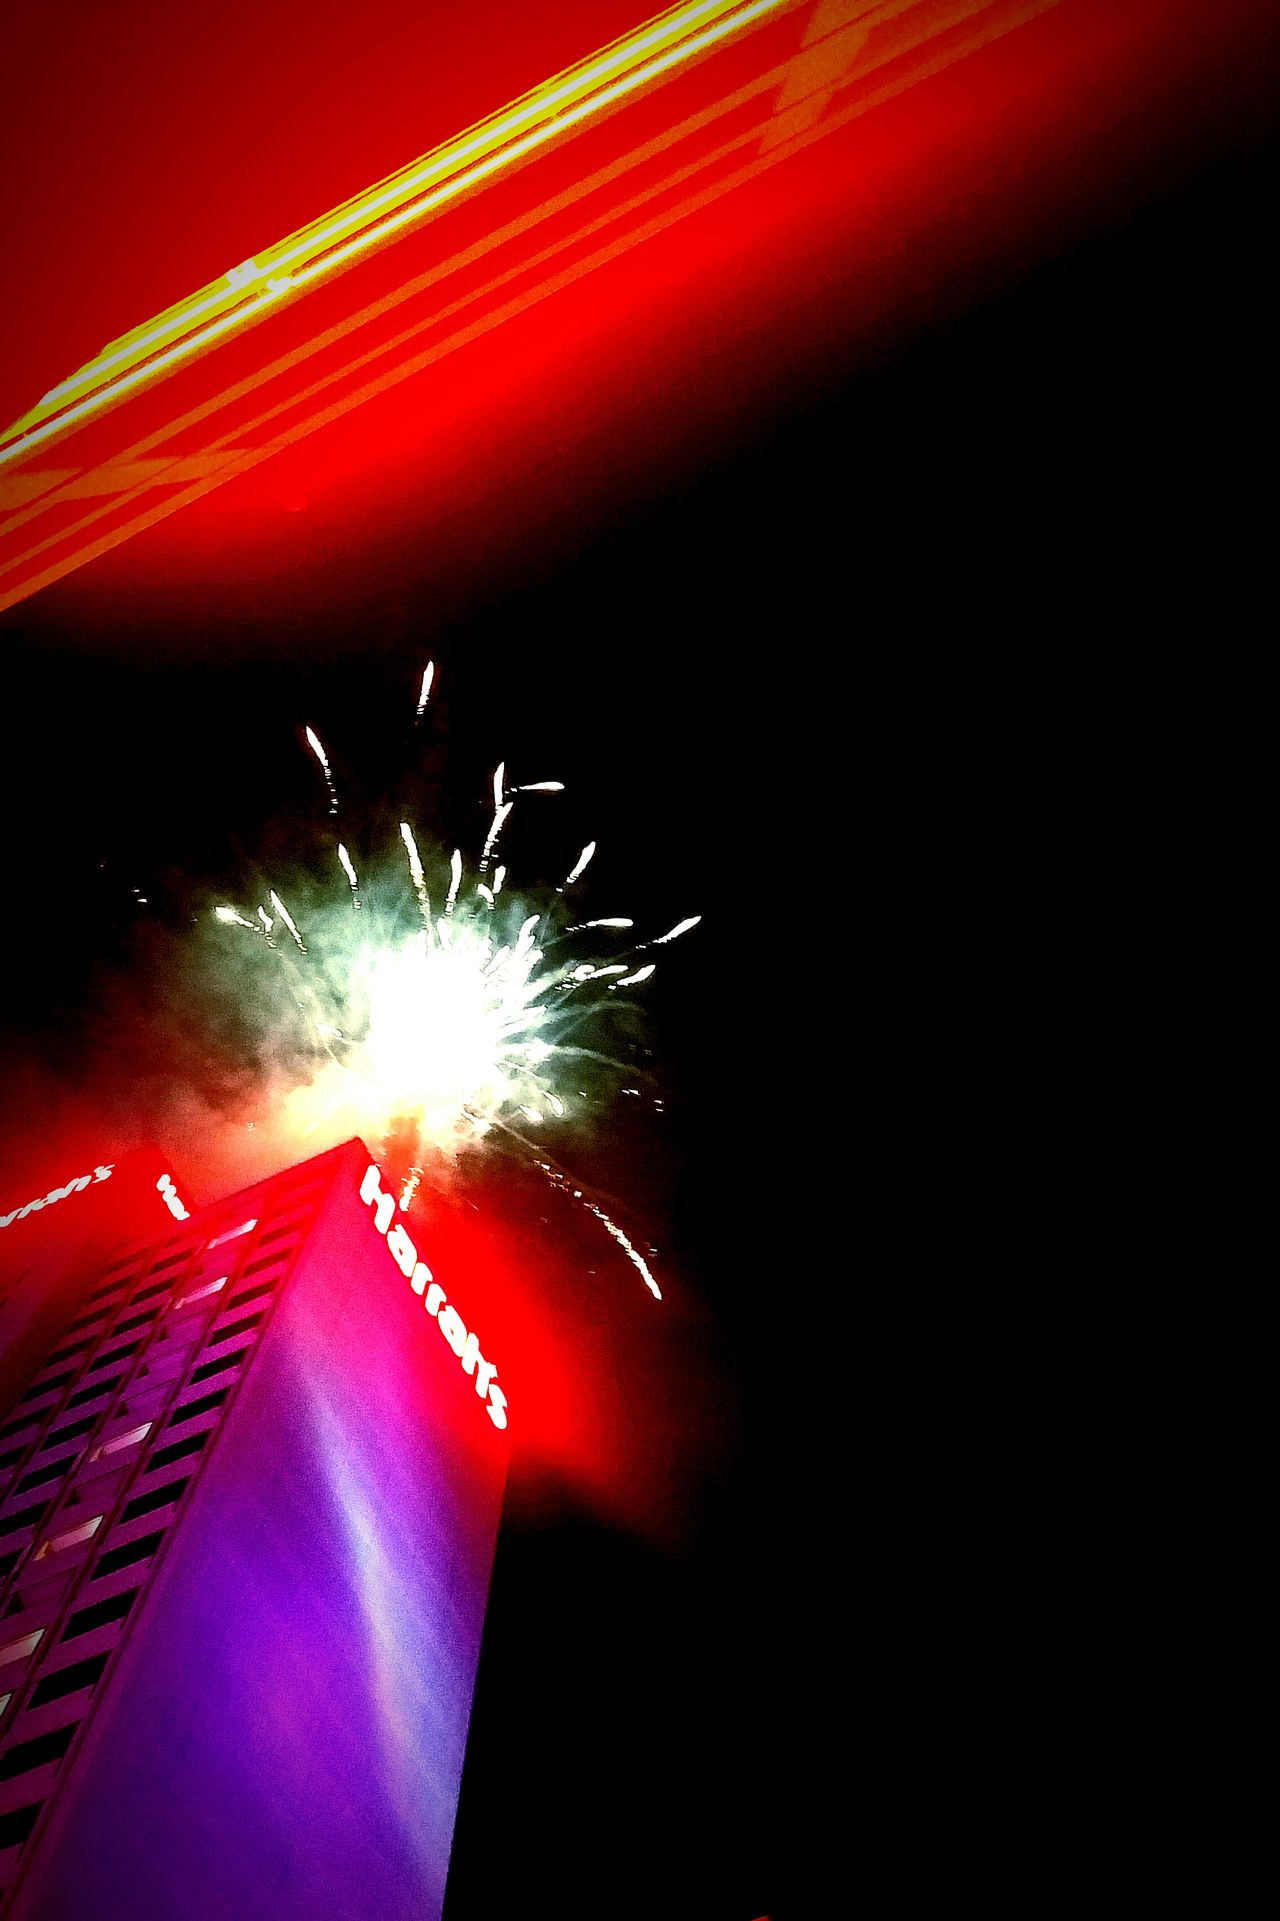 NYE Fireworks Illuminated Exploding Firework Display Celebration Reno, NV Sky City Outdoors Winter New Year Eve's Fireworks